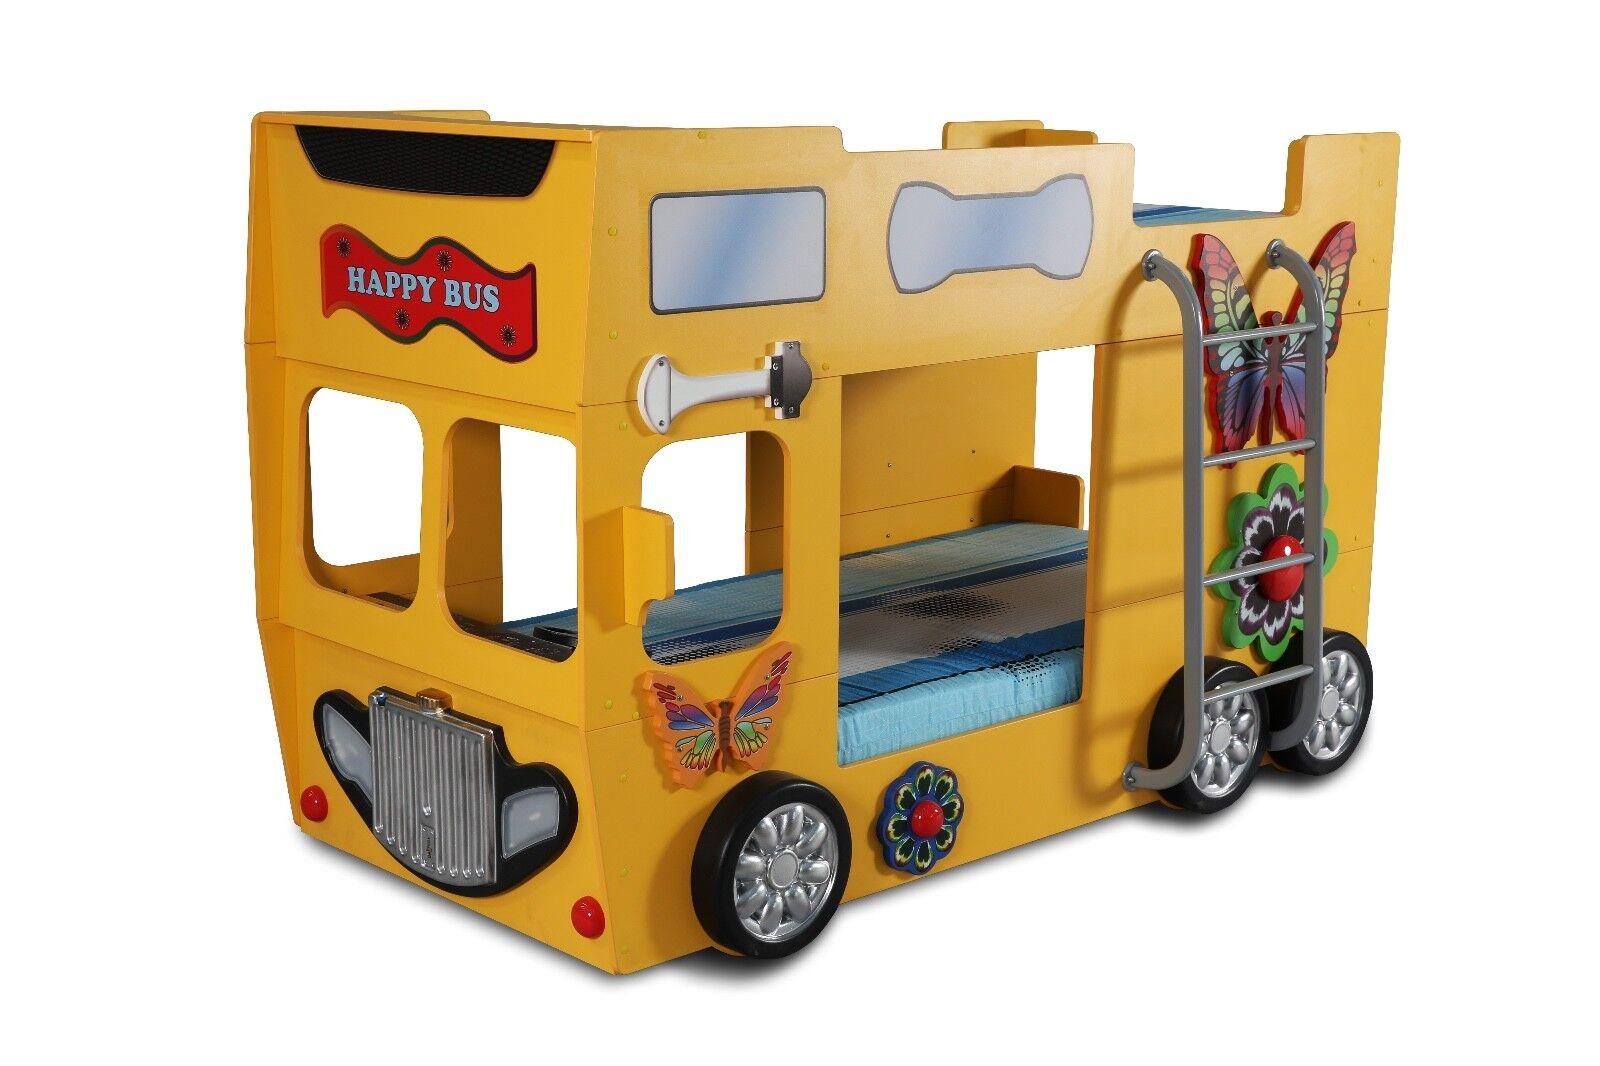 Etagenbett Auto : Kinderzimmer bett kinderbett etagenbett happy bus